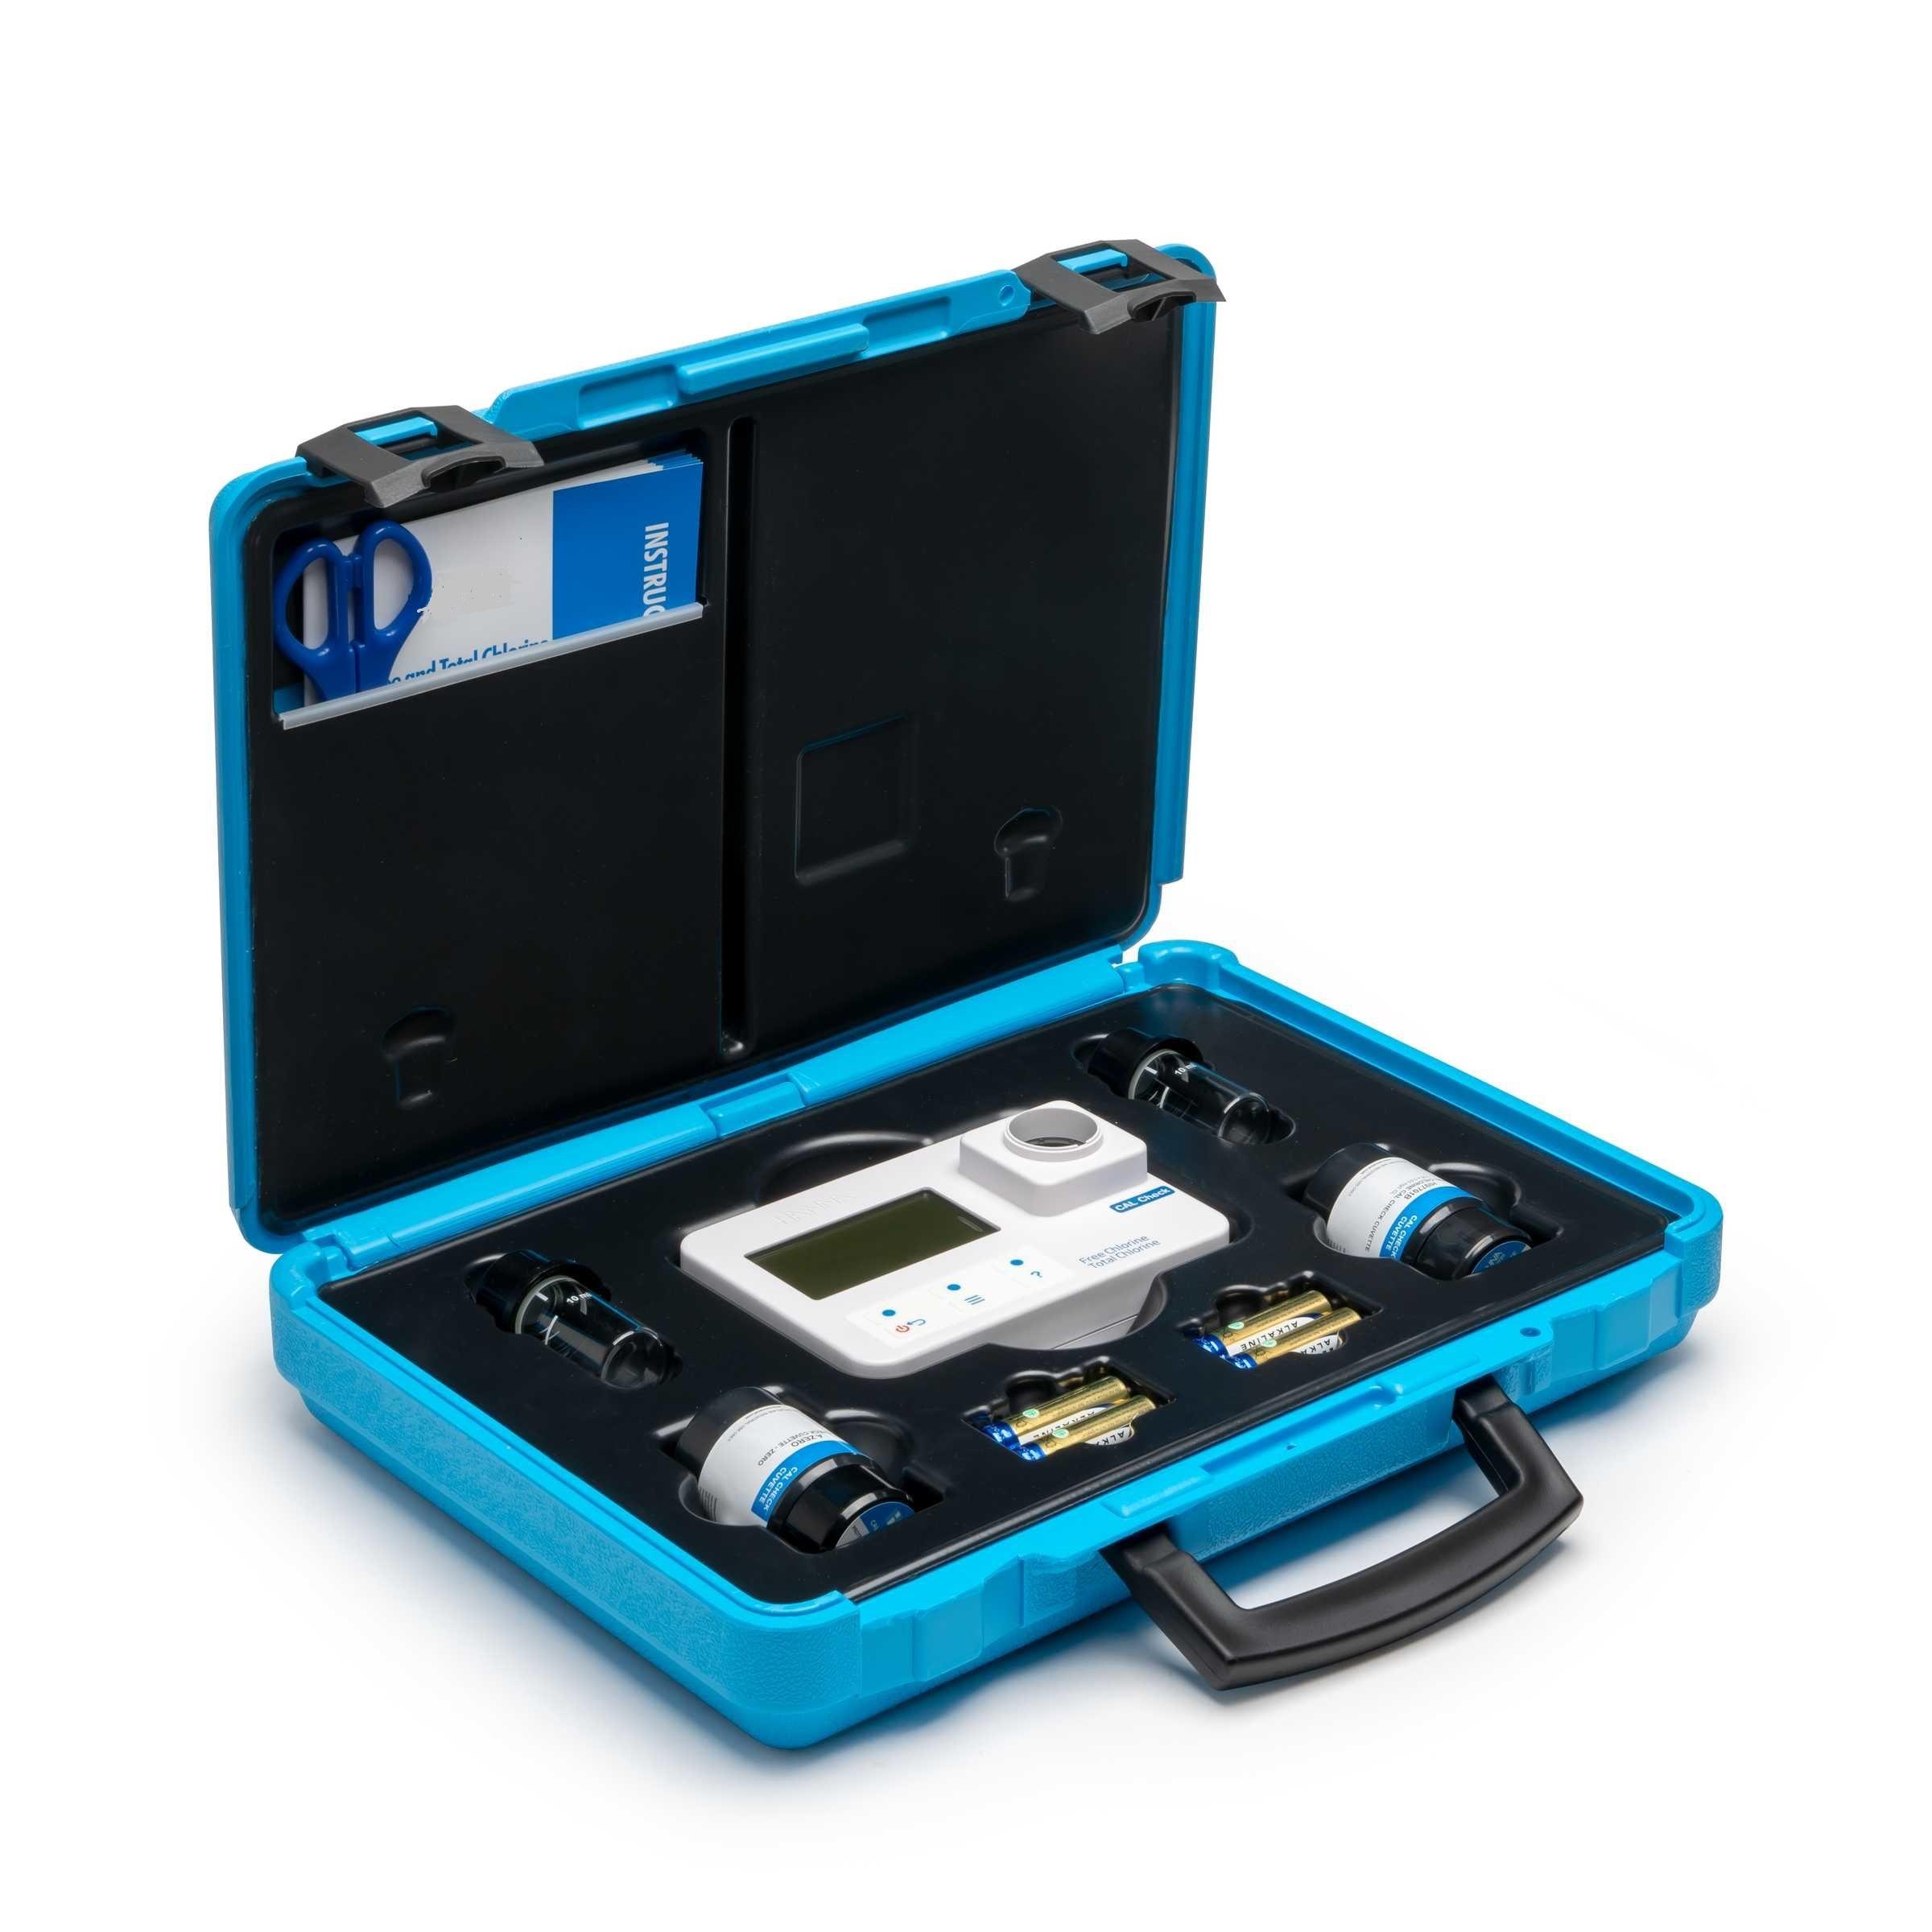 HI97733C KIT Ammonia High Range Portable Photometer with CAL Check